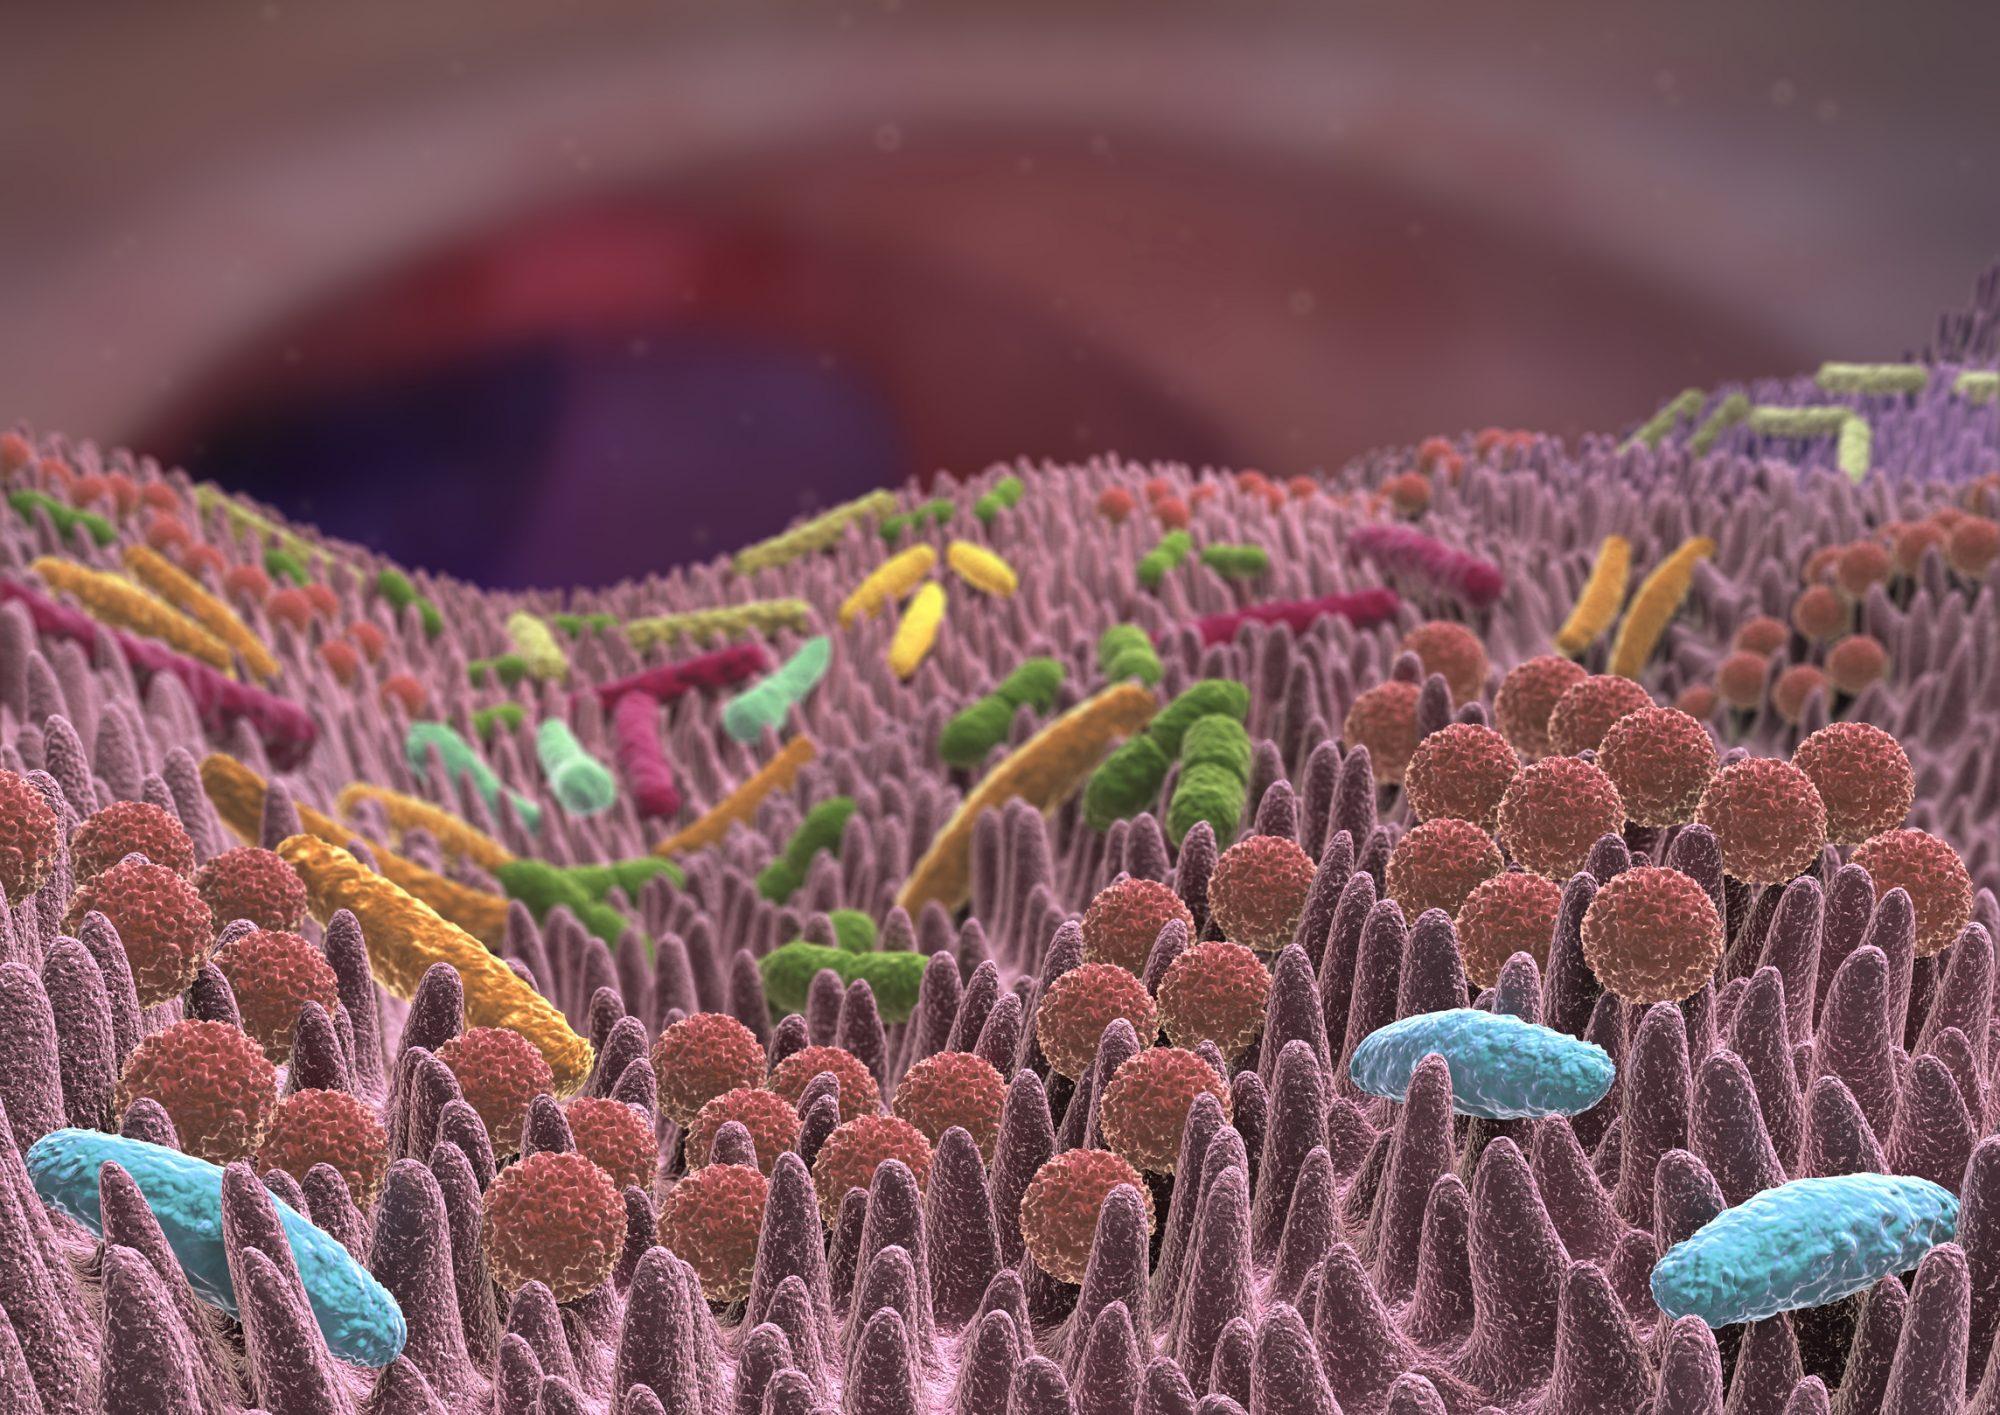 Gut microbiota 3D view, bacteria